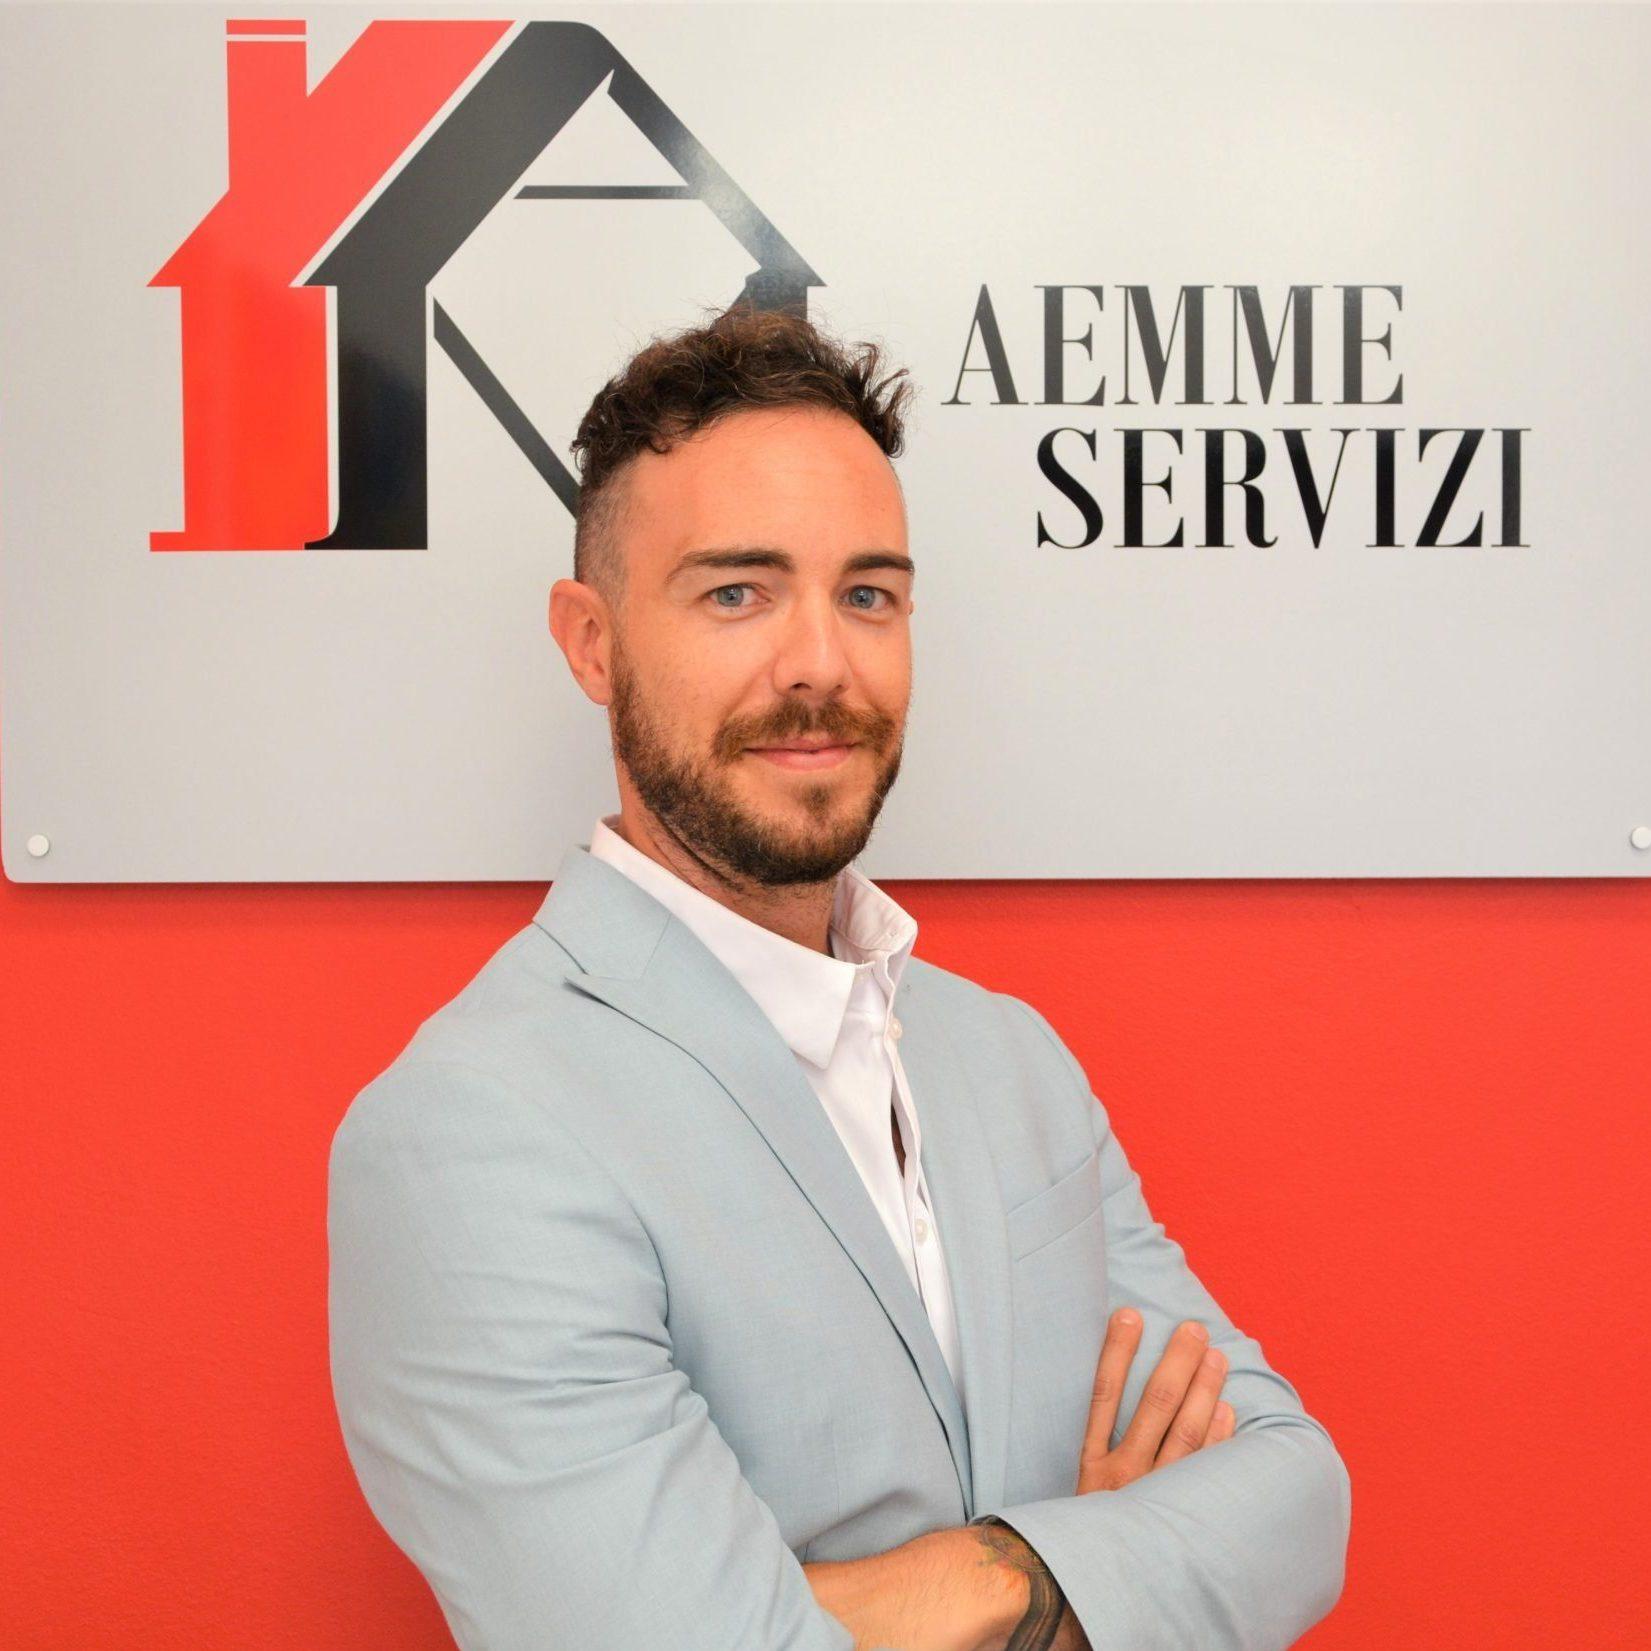 Nicola Ramorini Aemme Servizi Milano